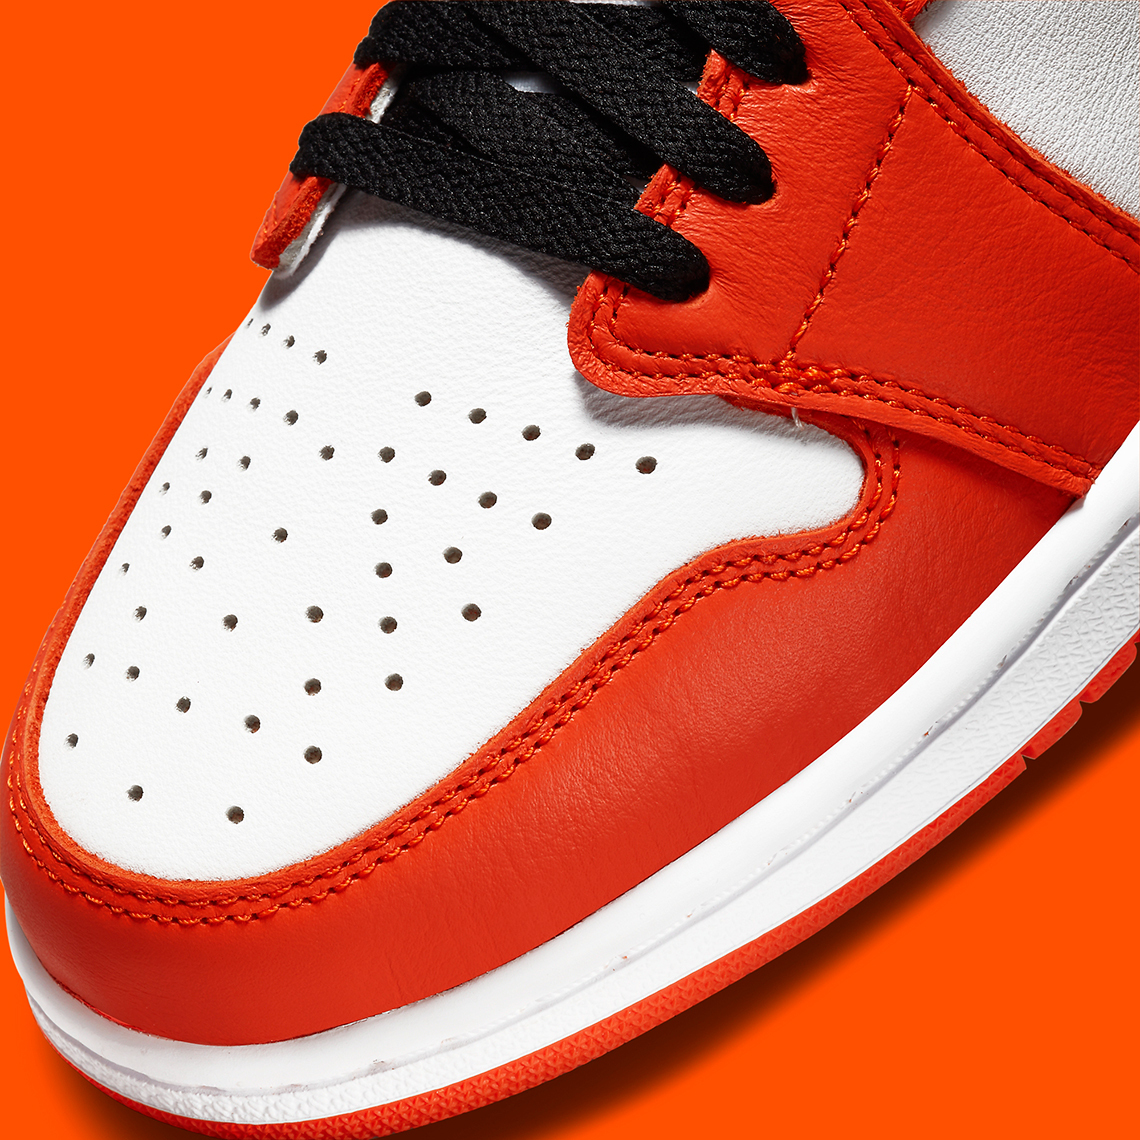 Air Jordan 1 Low OG ''Shattered Backboard'' - CZ0790-801